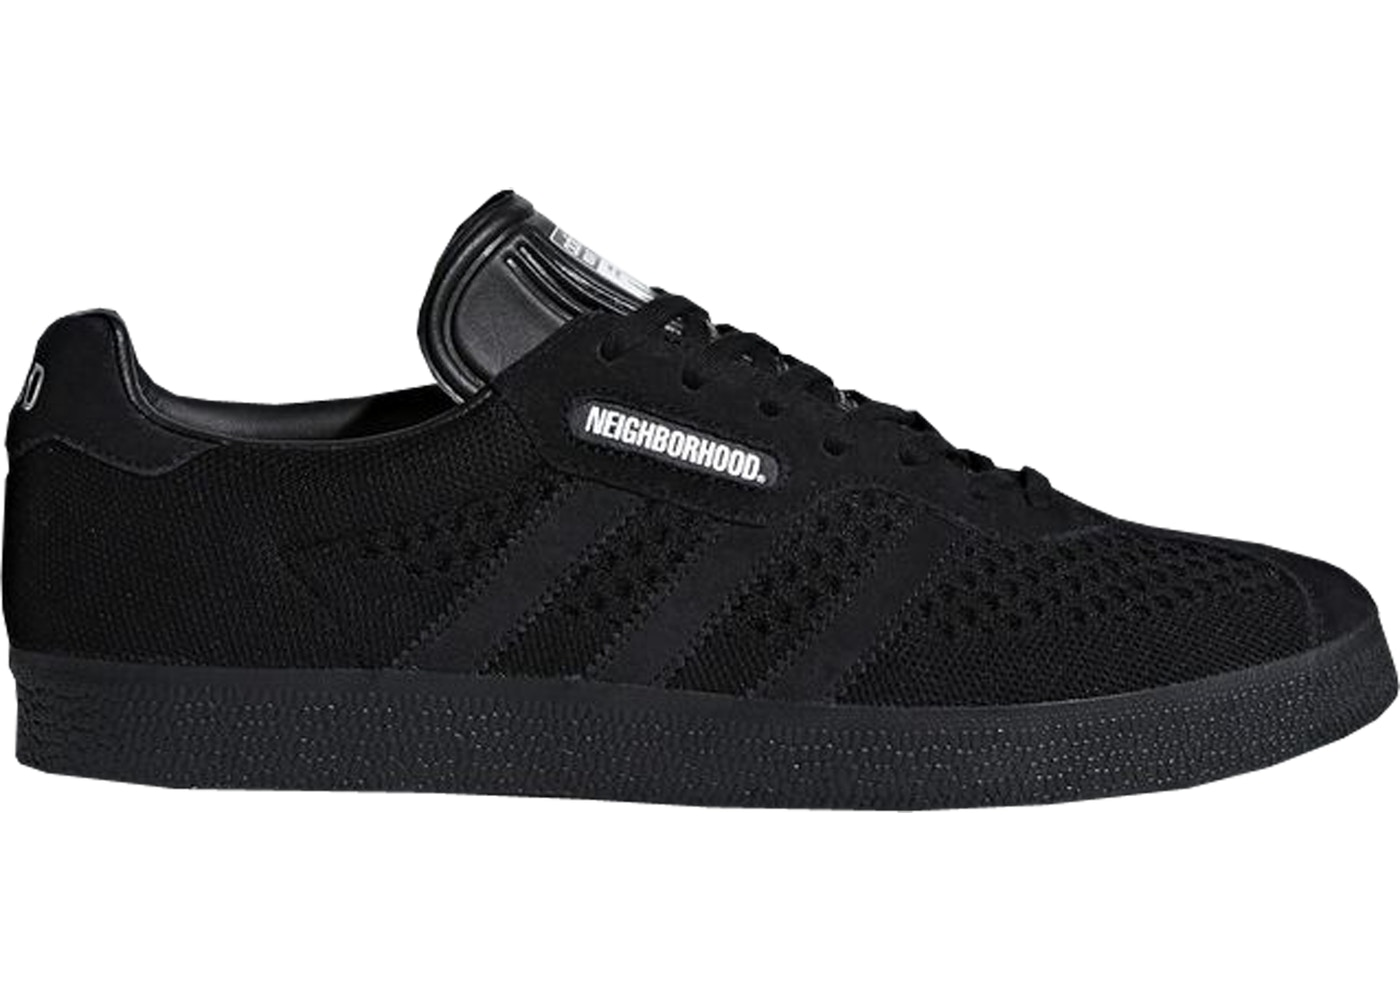 adidas Gazelle Super Neighborhood Triple Black - DA8836